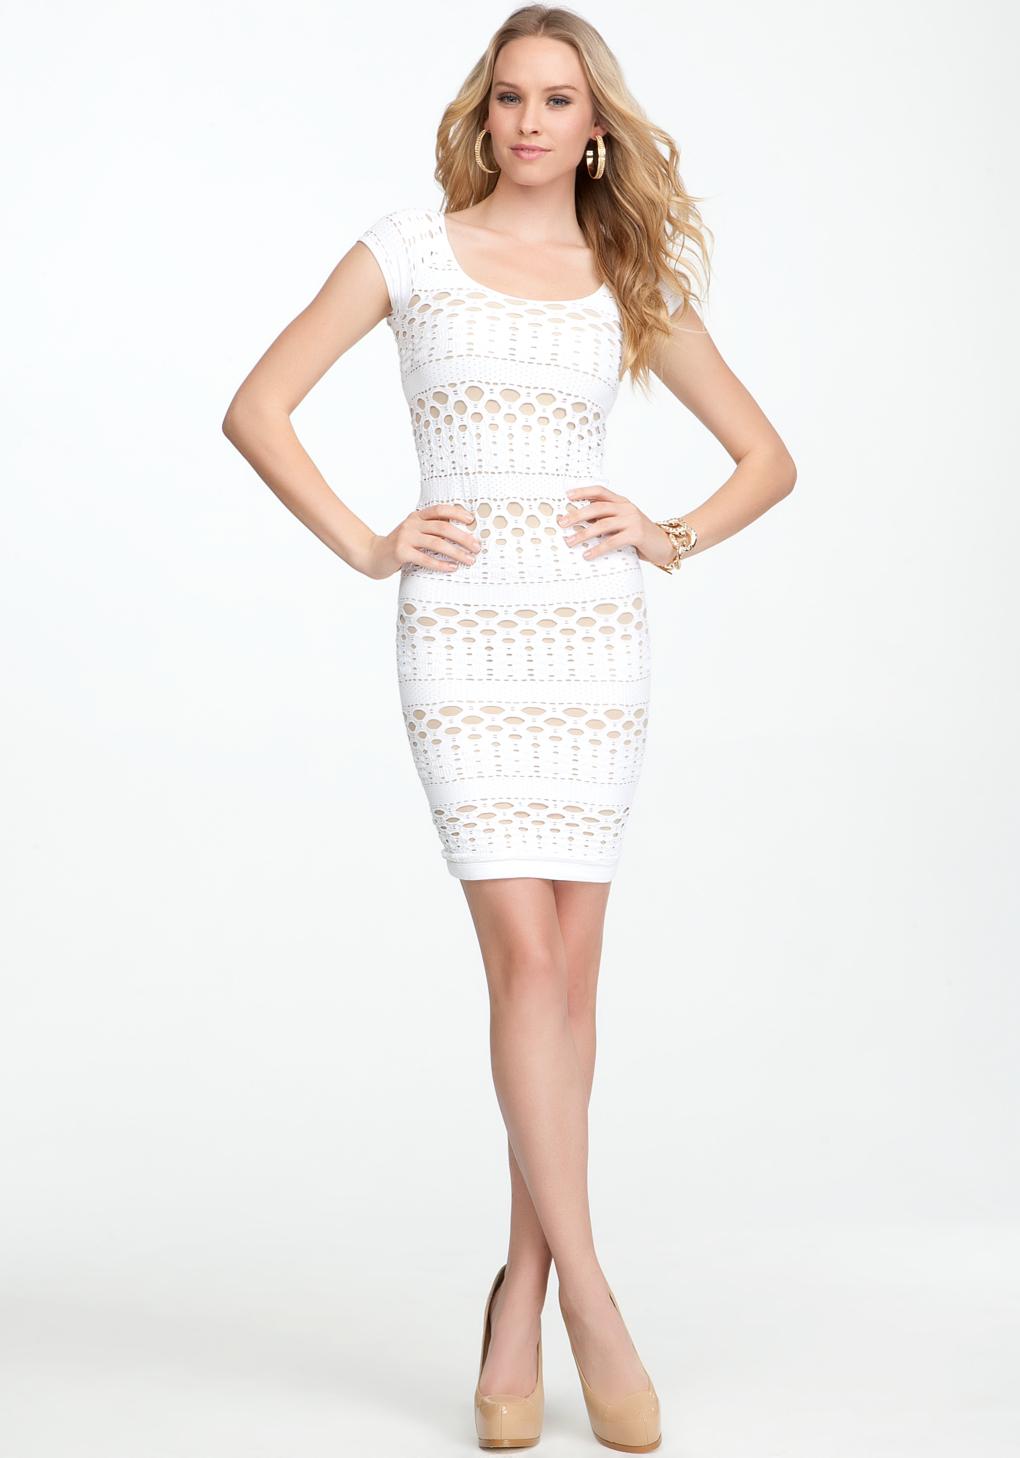 Bebe Sleeveless Keyhole Dress in White | Lyst